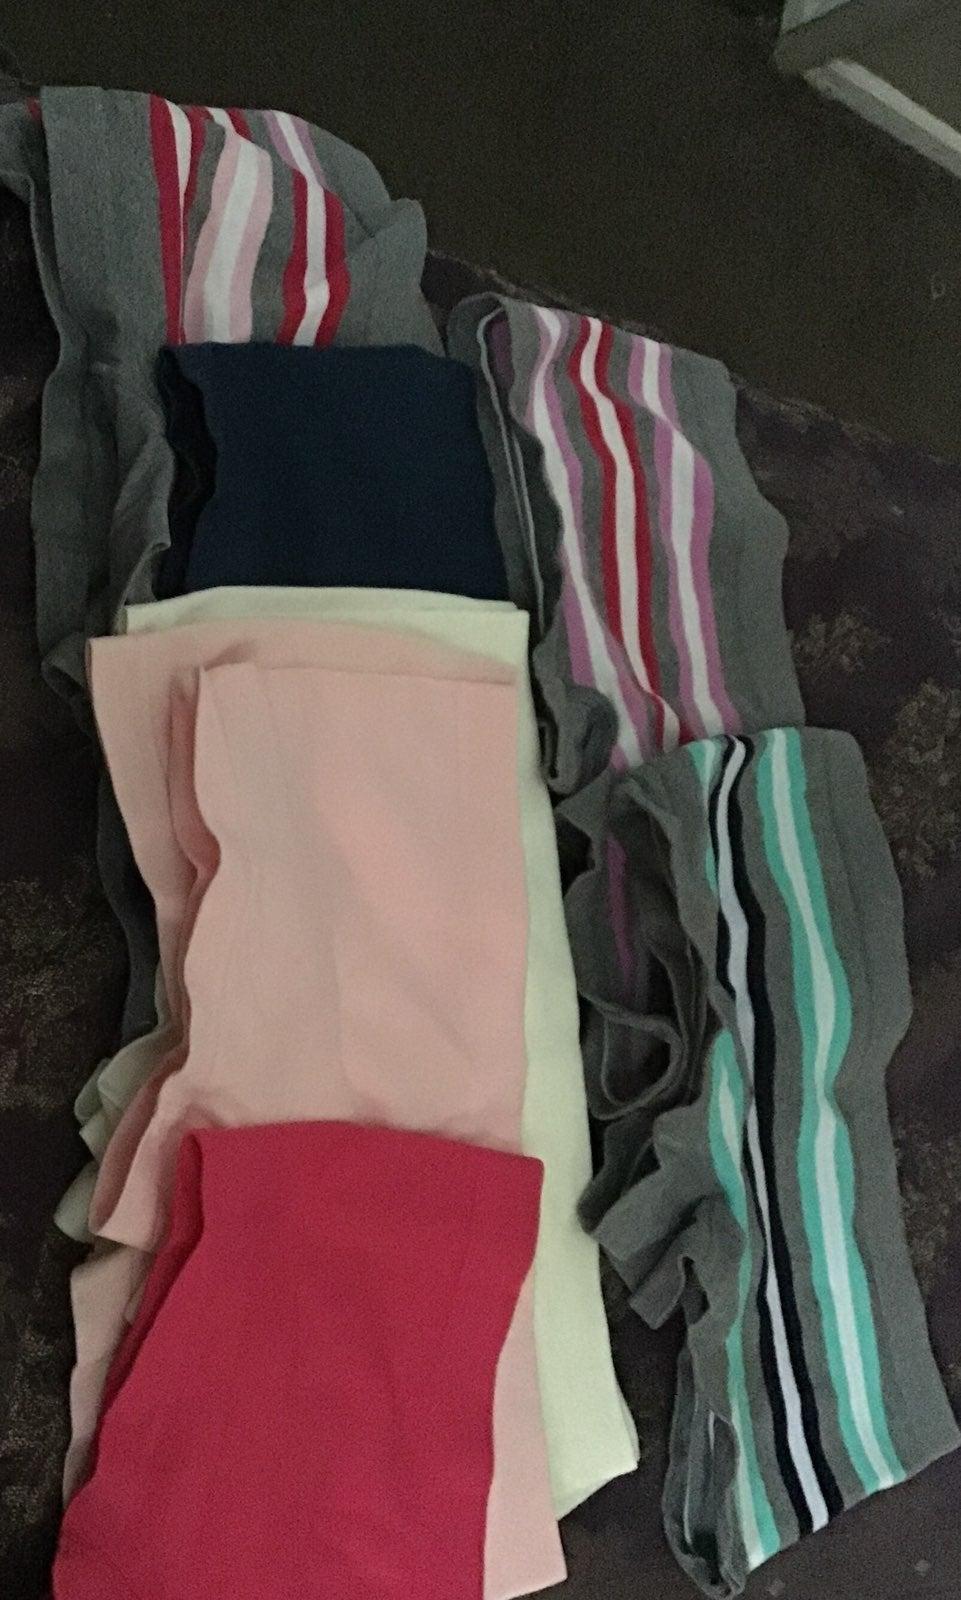 10:Girls boyshorts underwear